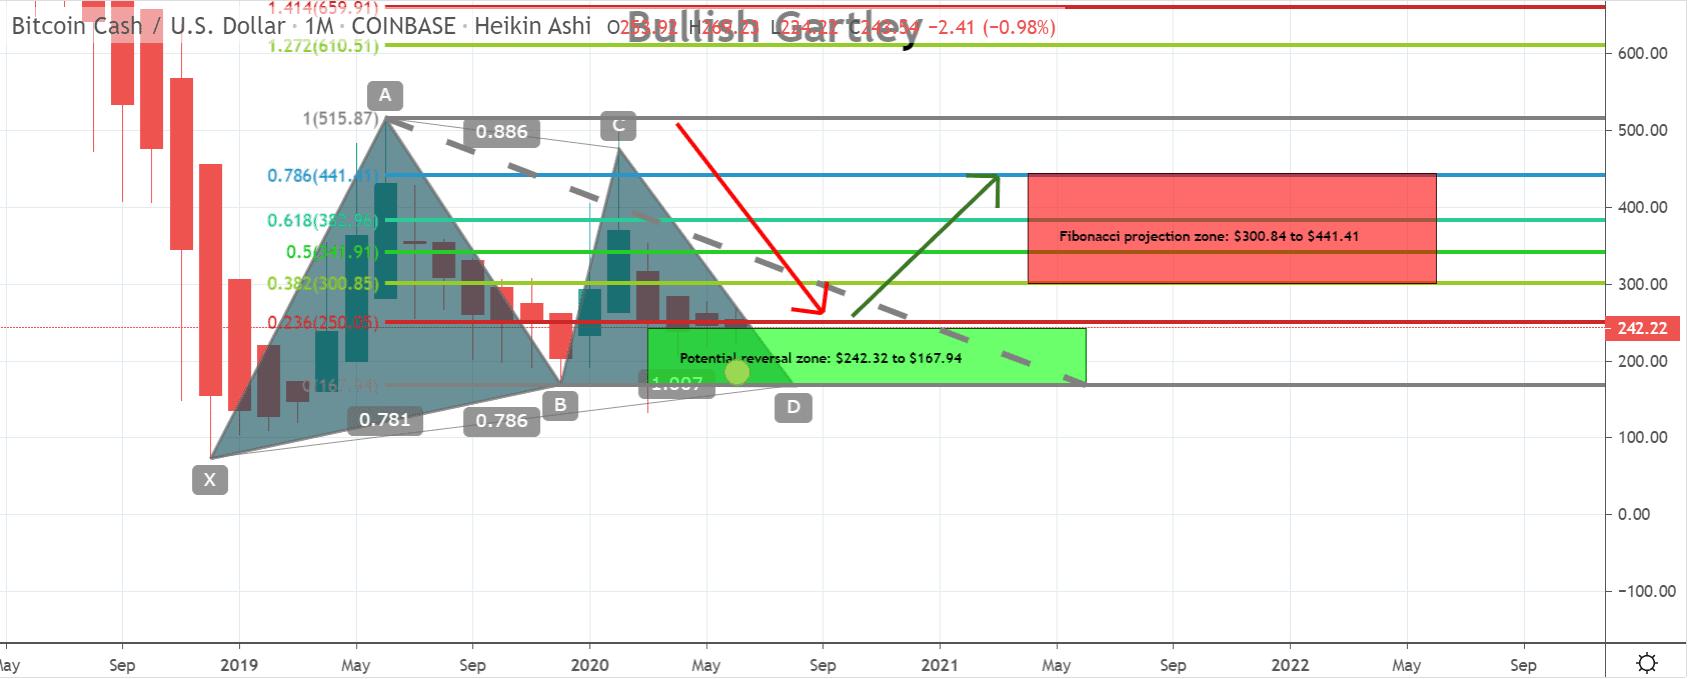 Bitcoin Cash price 3 - 23 June